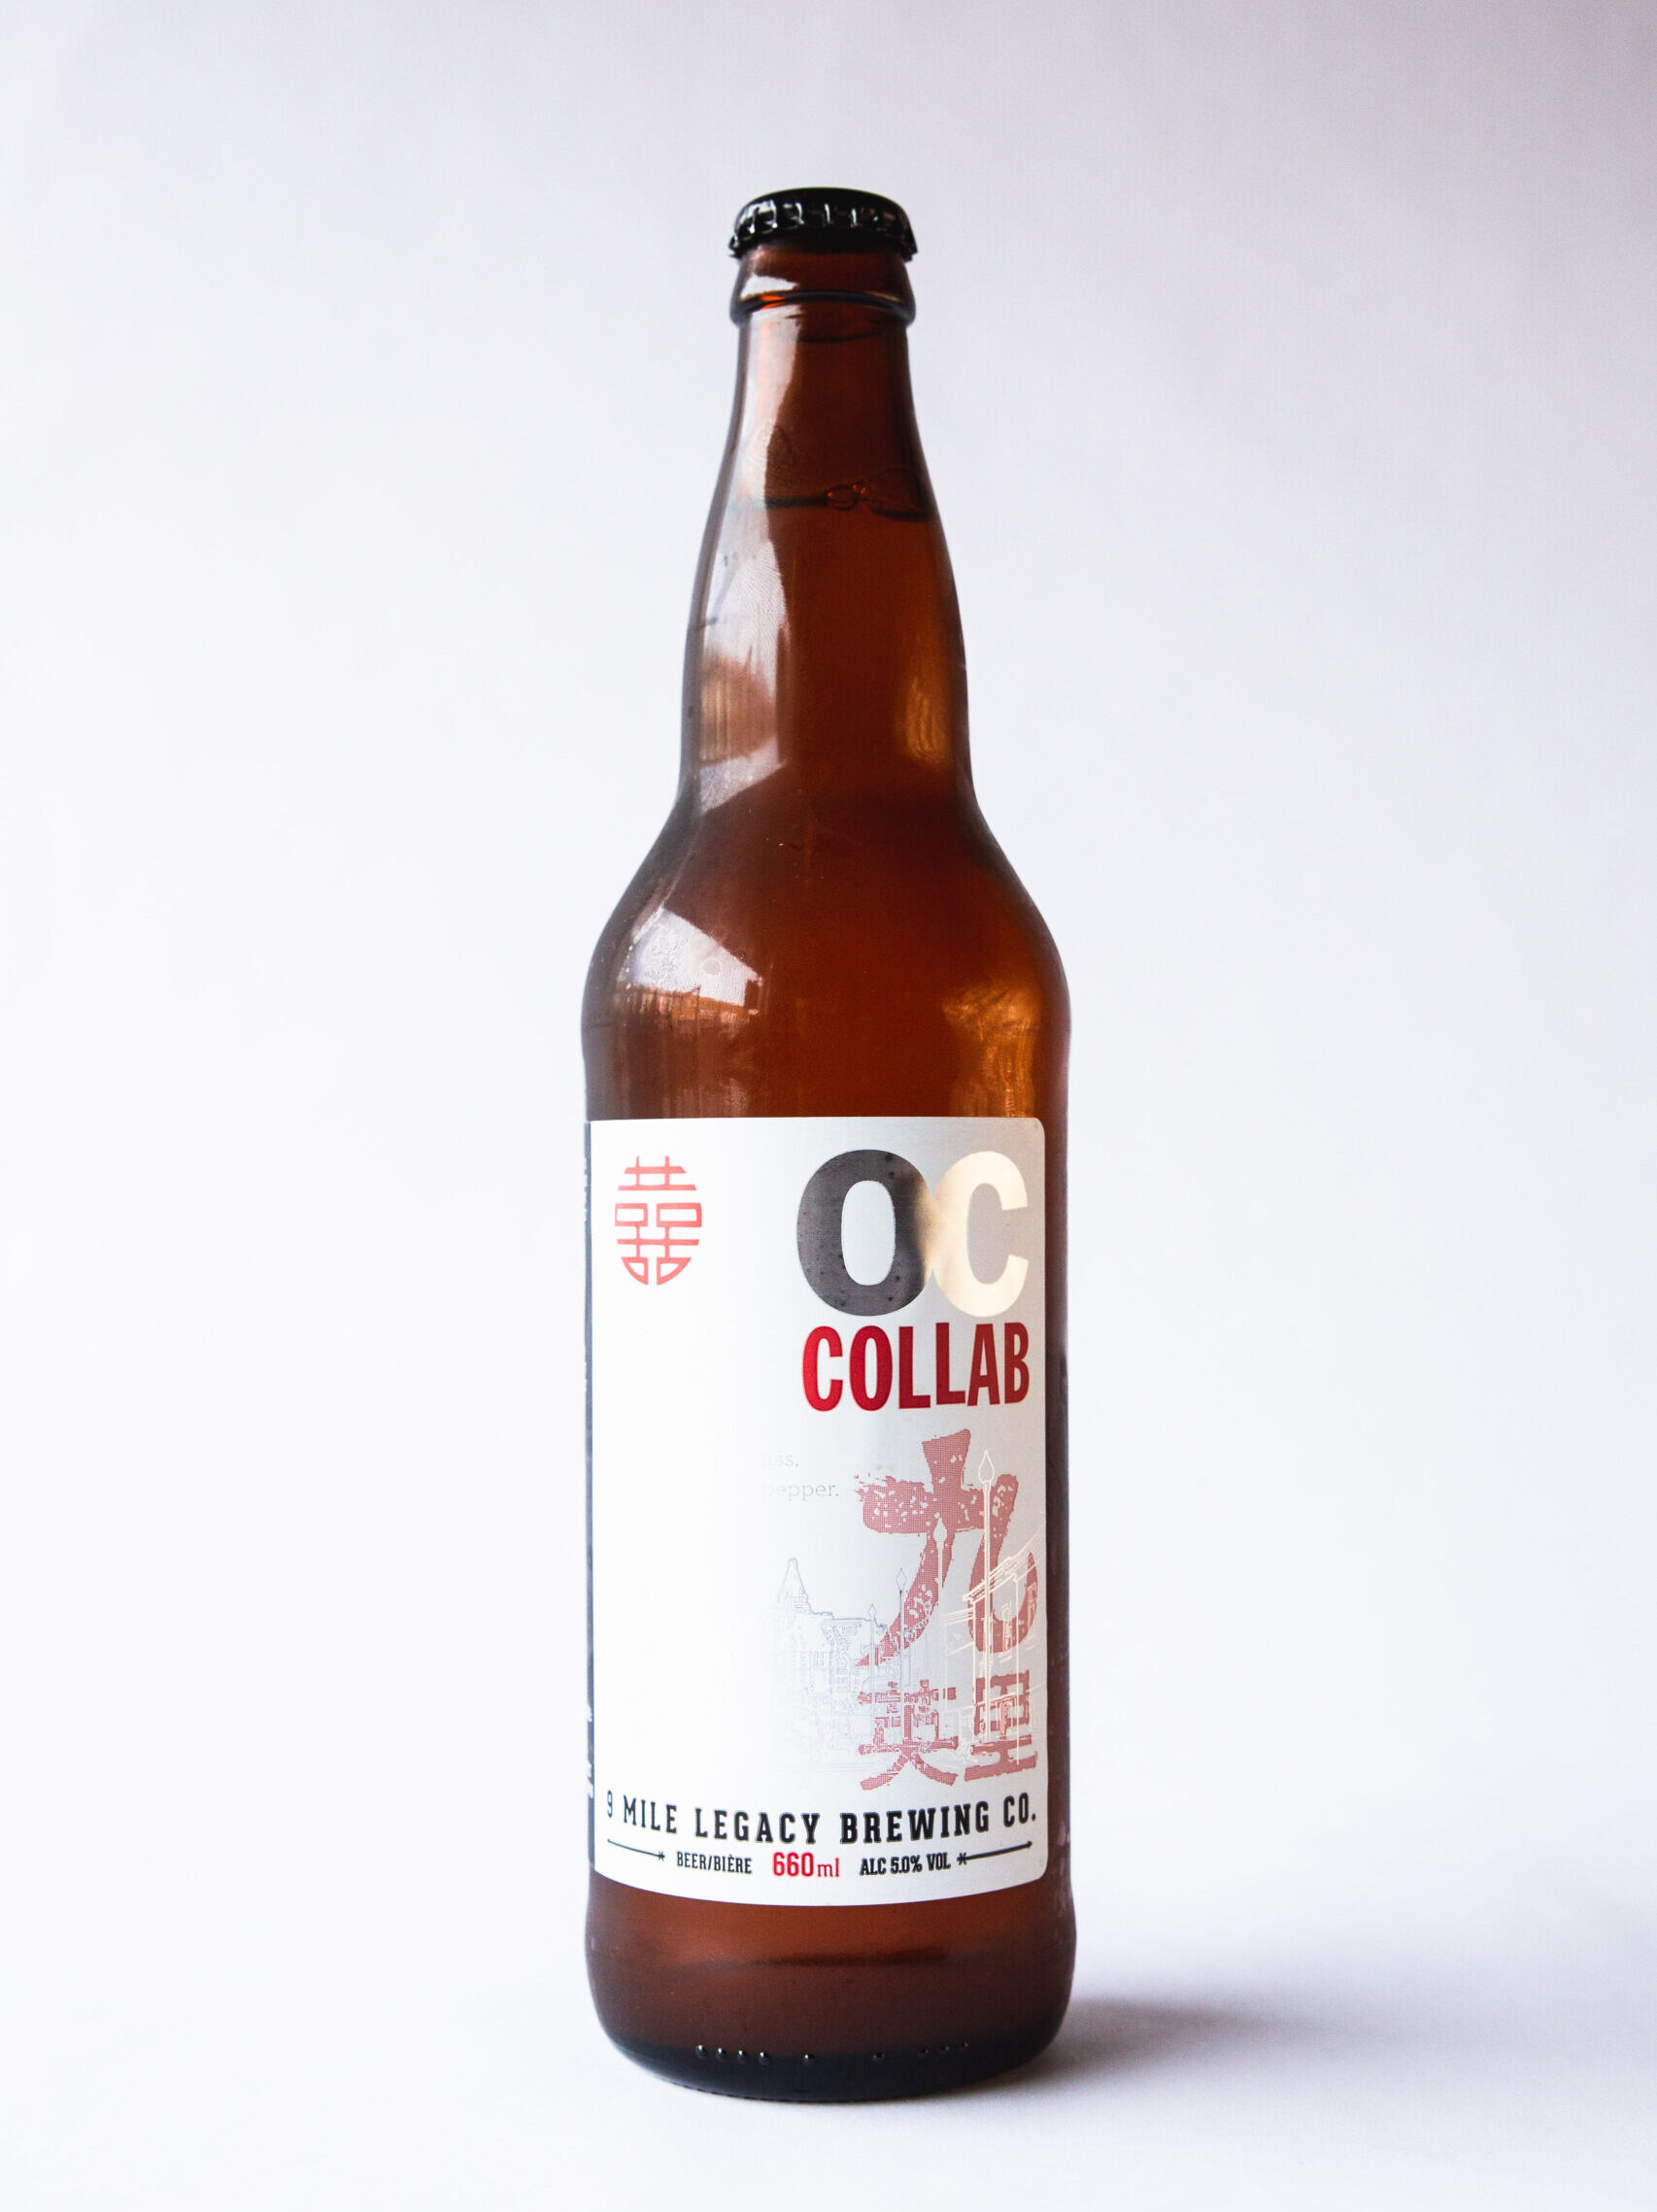 OC Collab